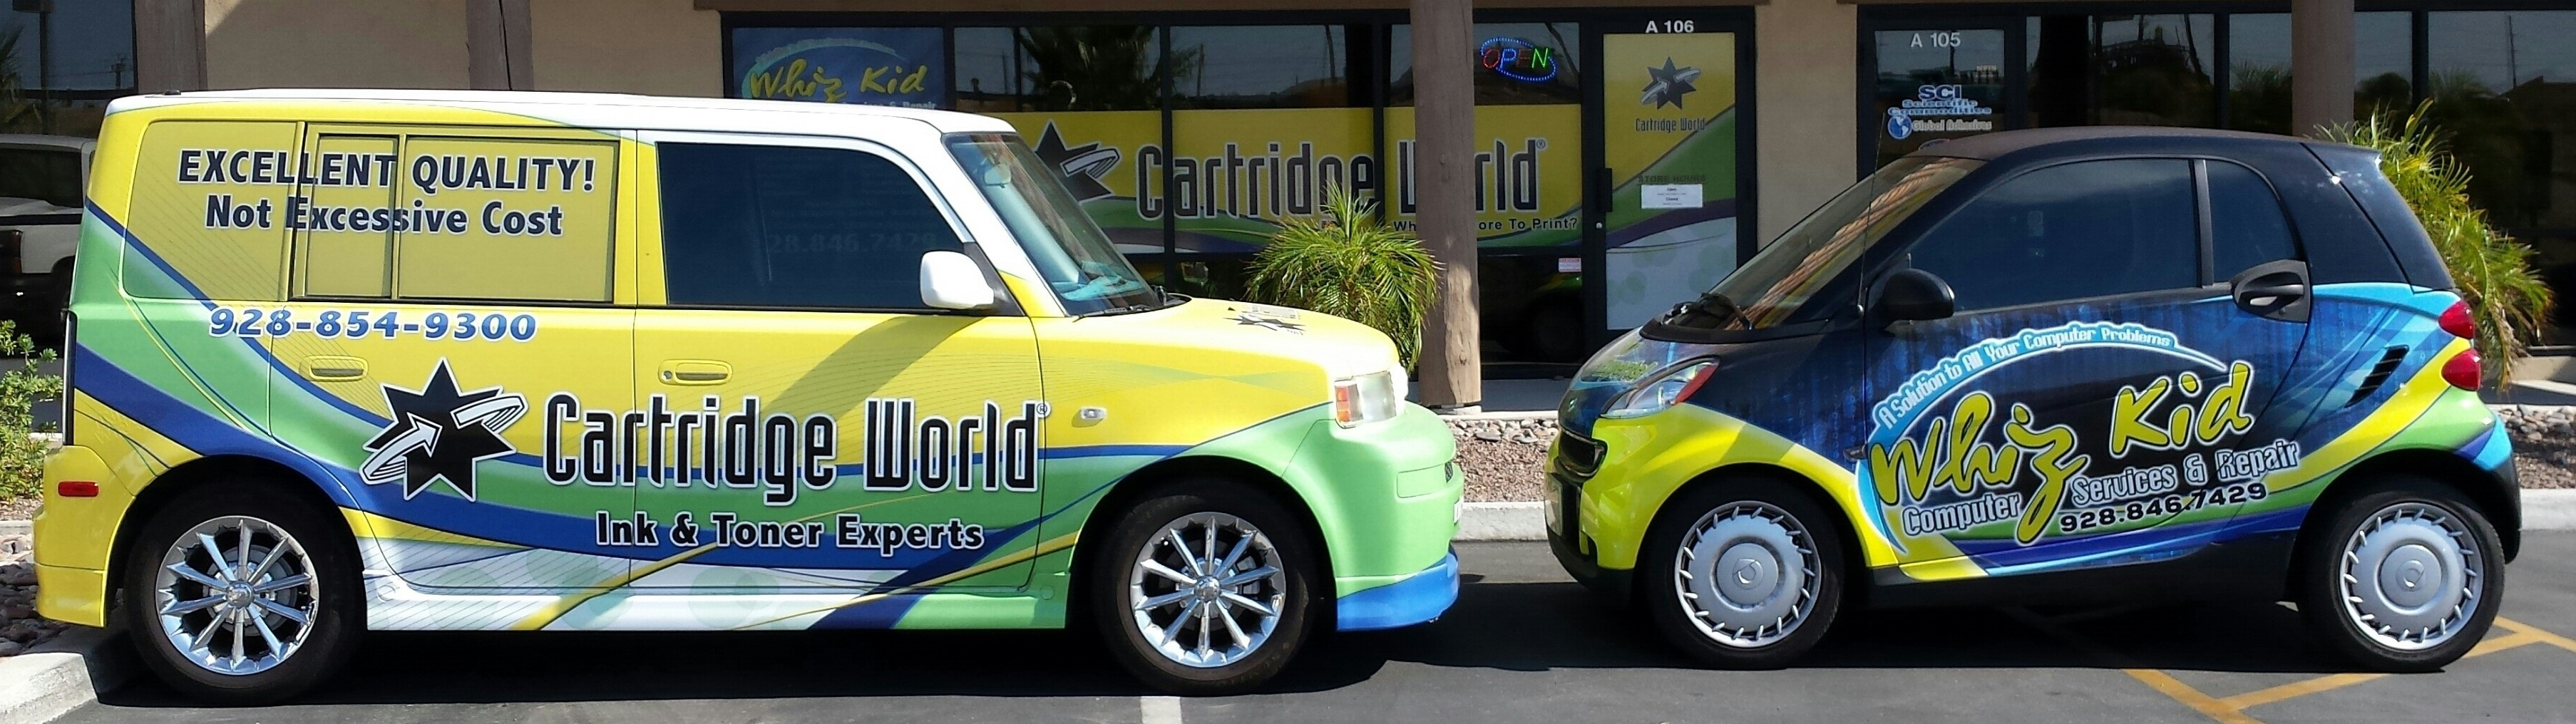 Cartridge World Lake Havasu City